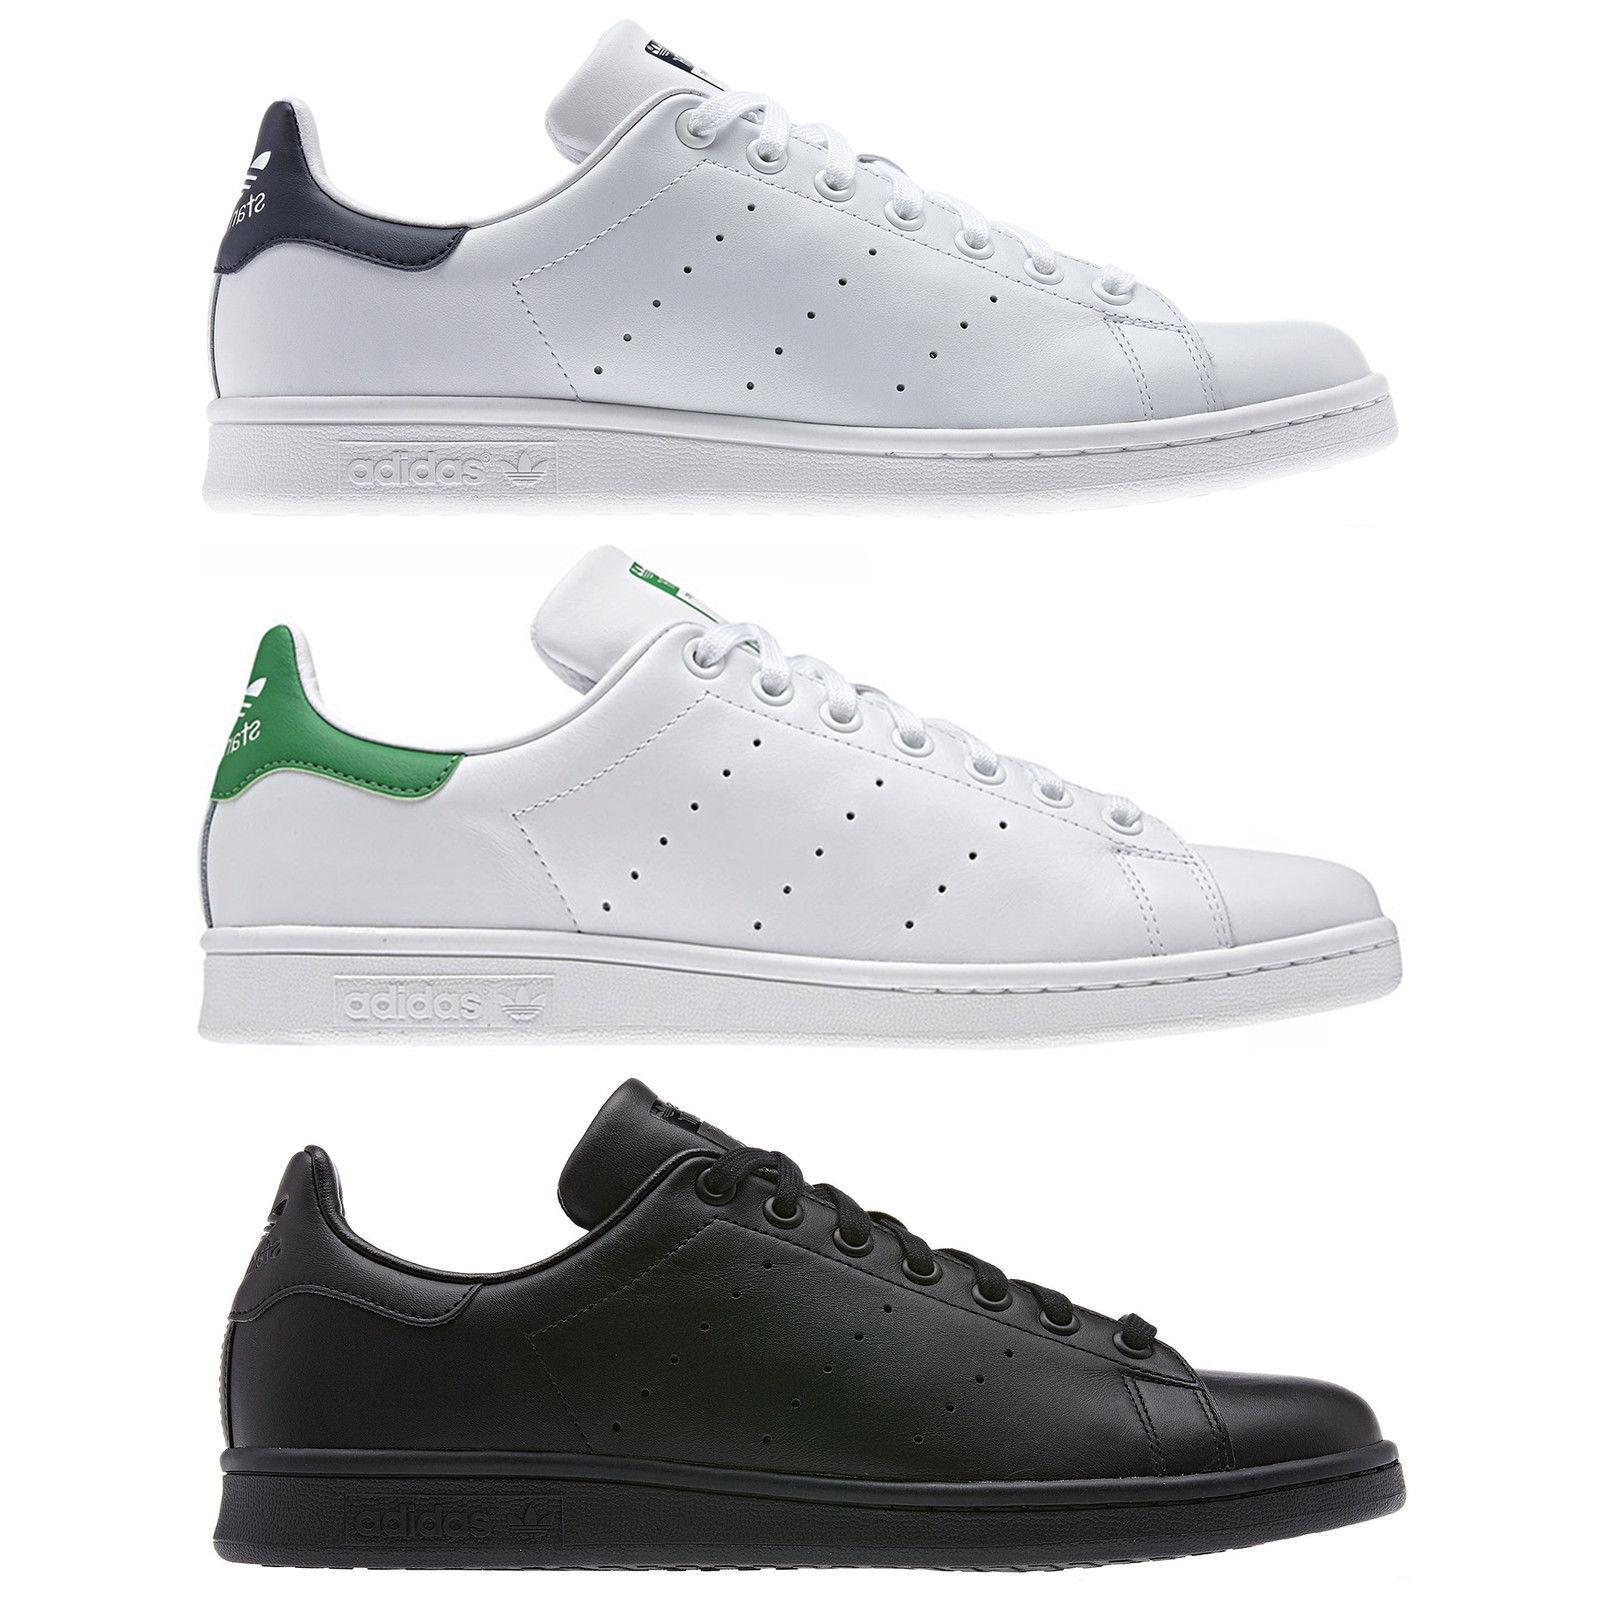 design de qualité 39024 d3bc6 Adidas Originals Mens Stan Smith Trainers Skate Shoes Sports all size